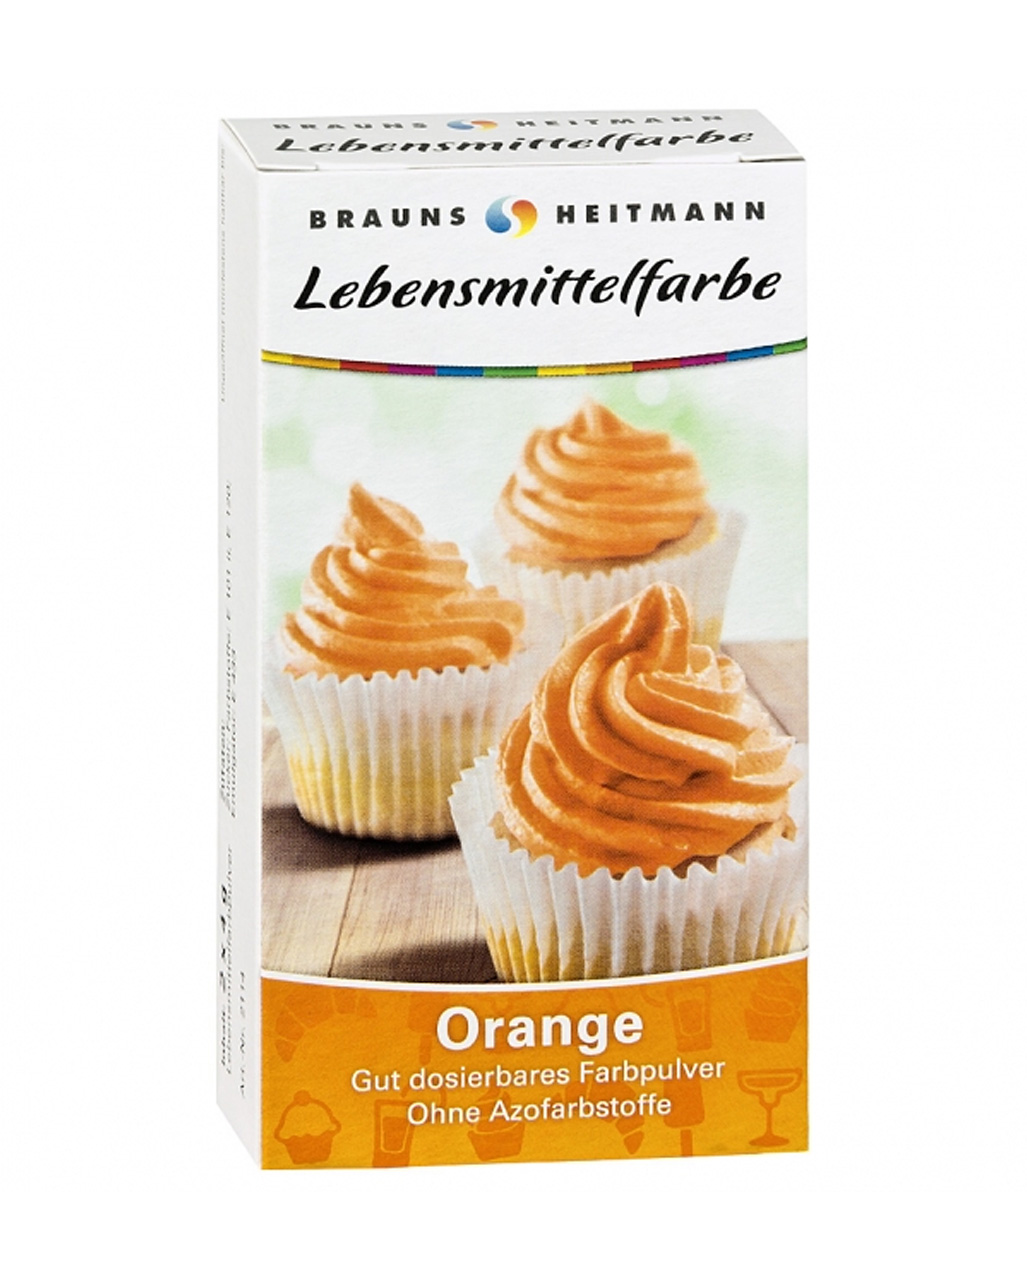 Food color orange | Colorful food coloring | horror-shop.com